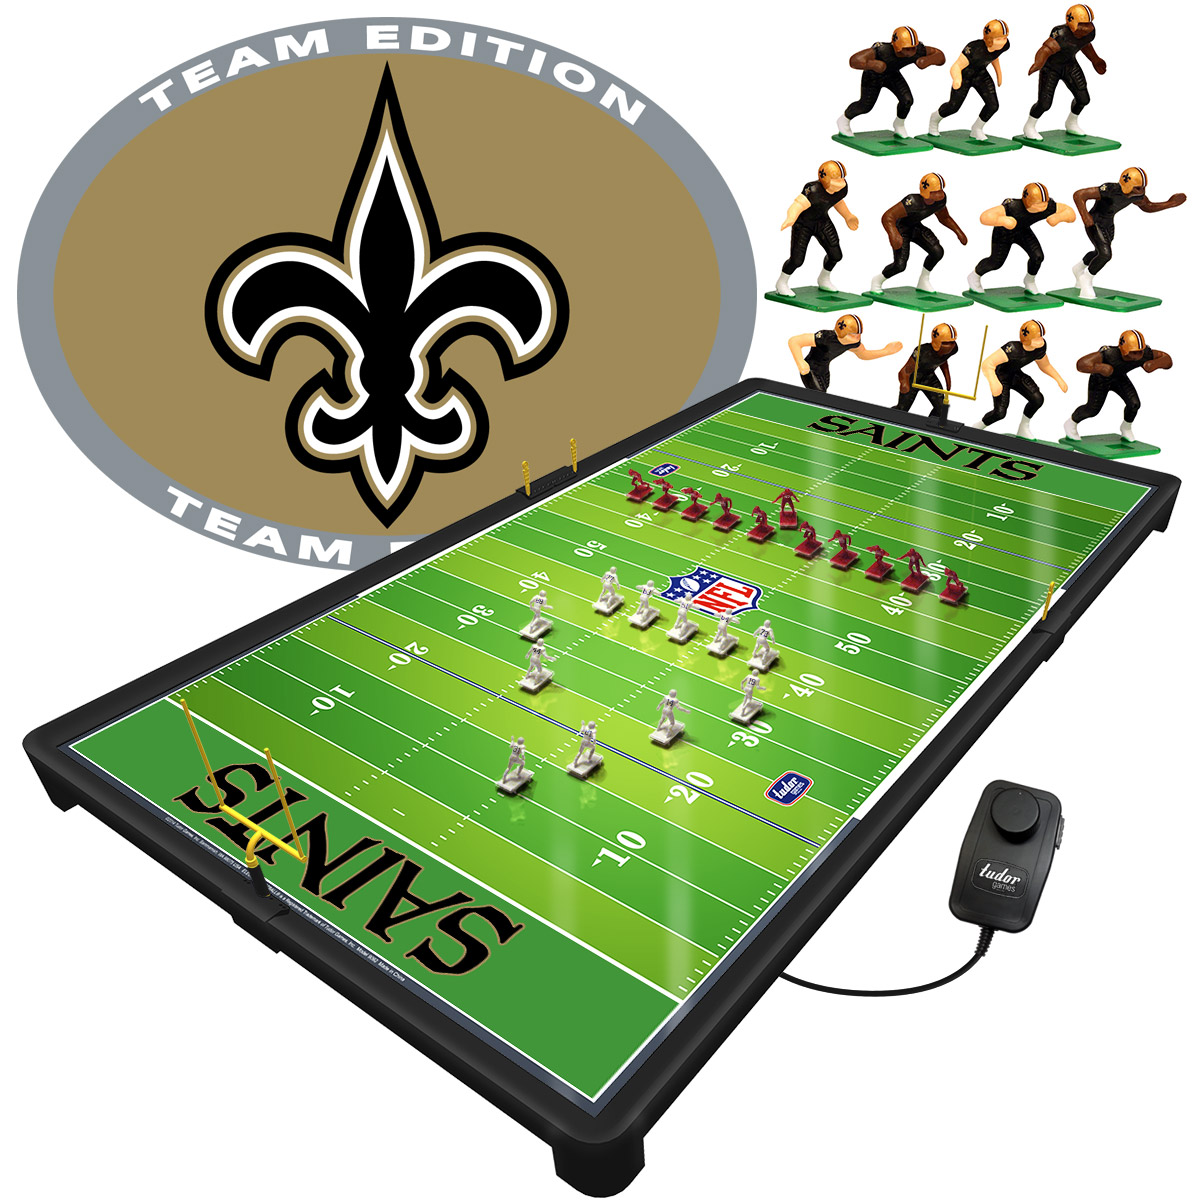 New Orleans Saints NFL Pro Bowl Electric Football Game Set